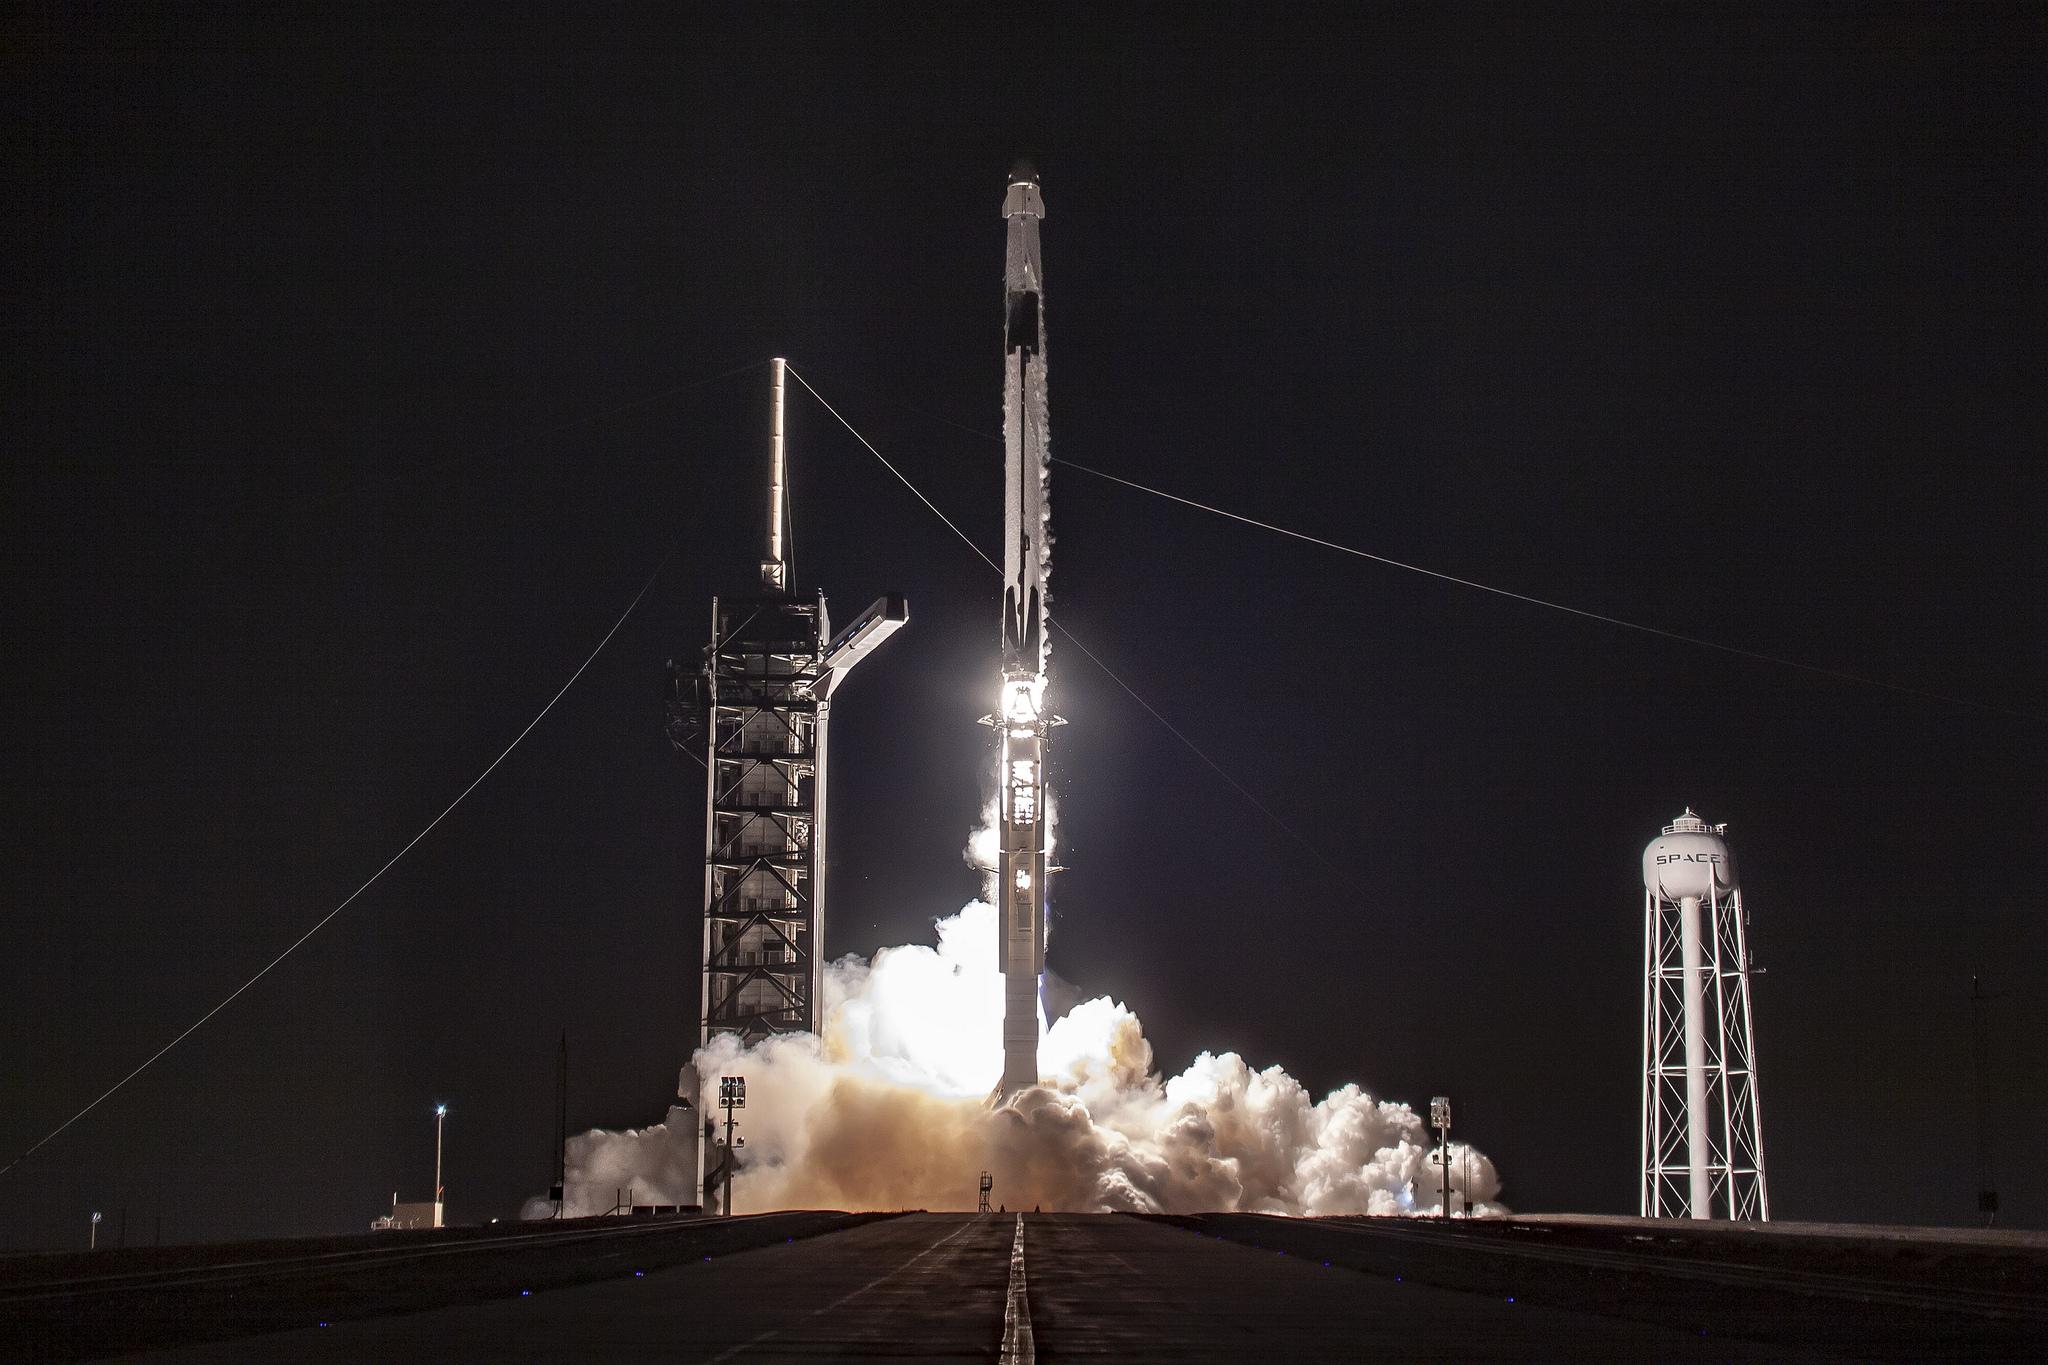 Crew Dragon launches